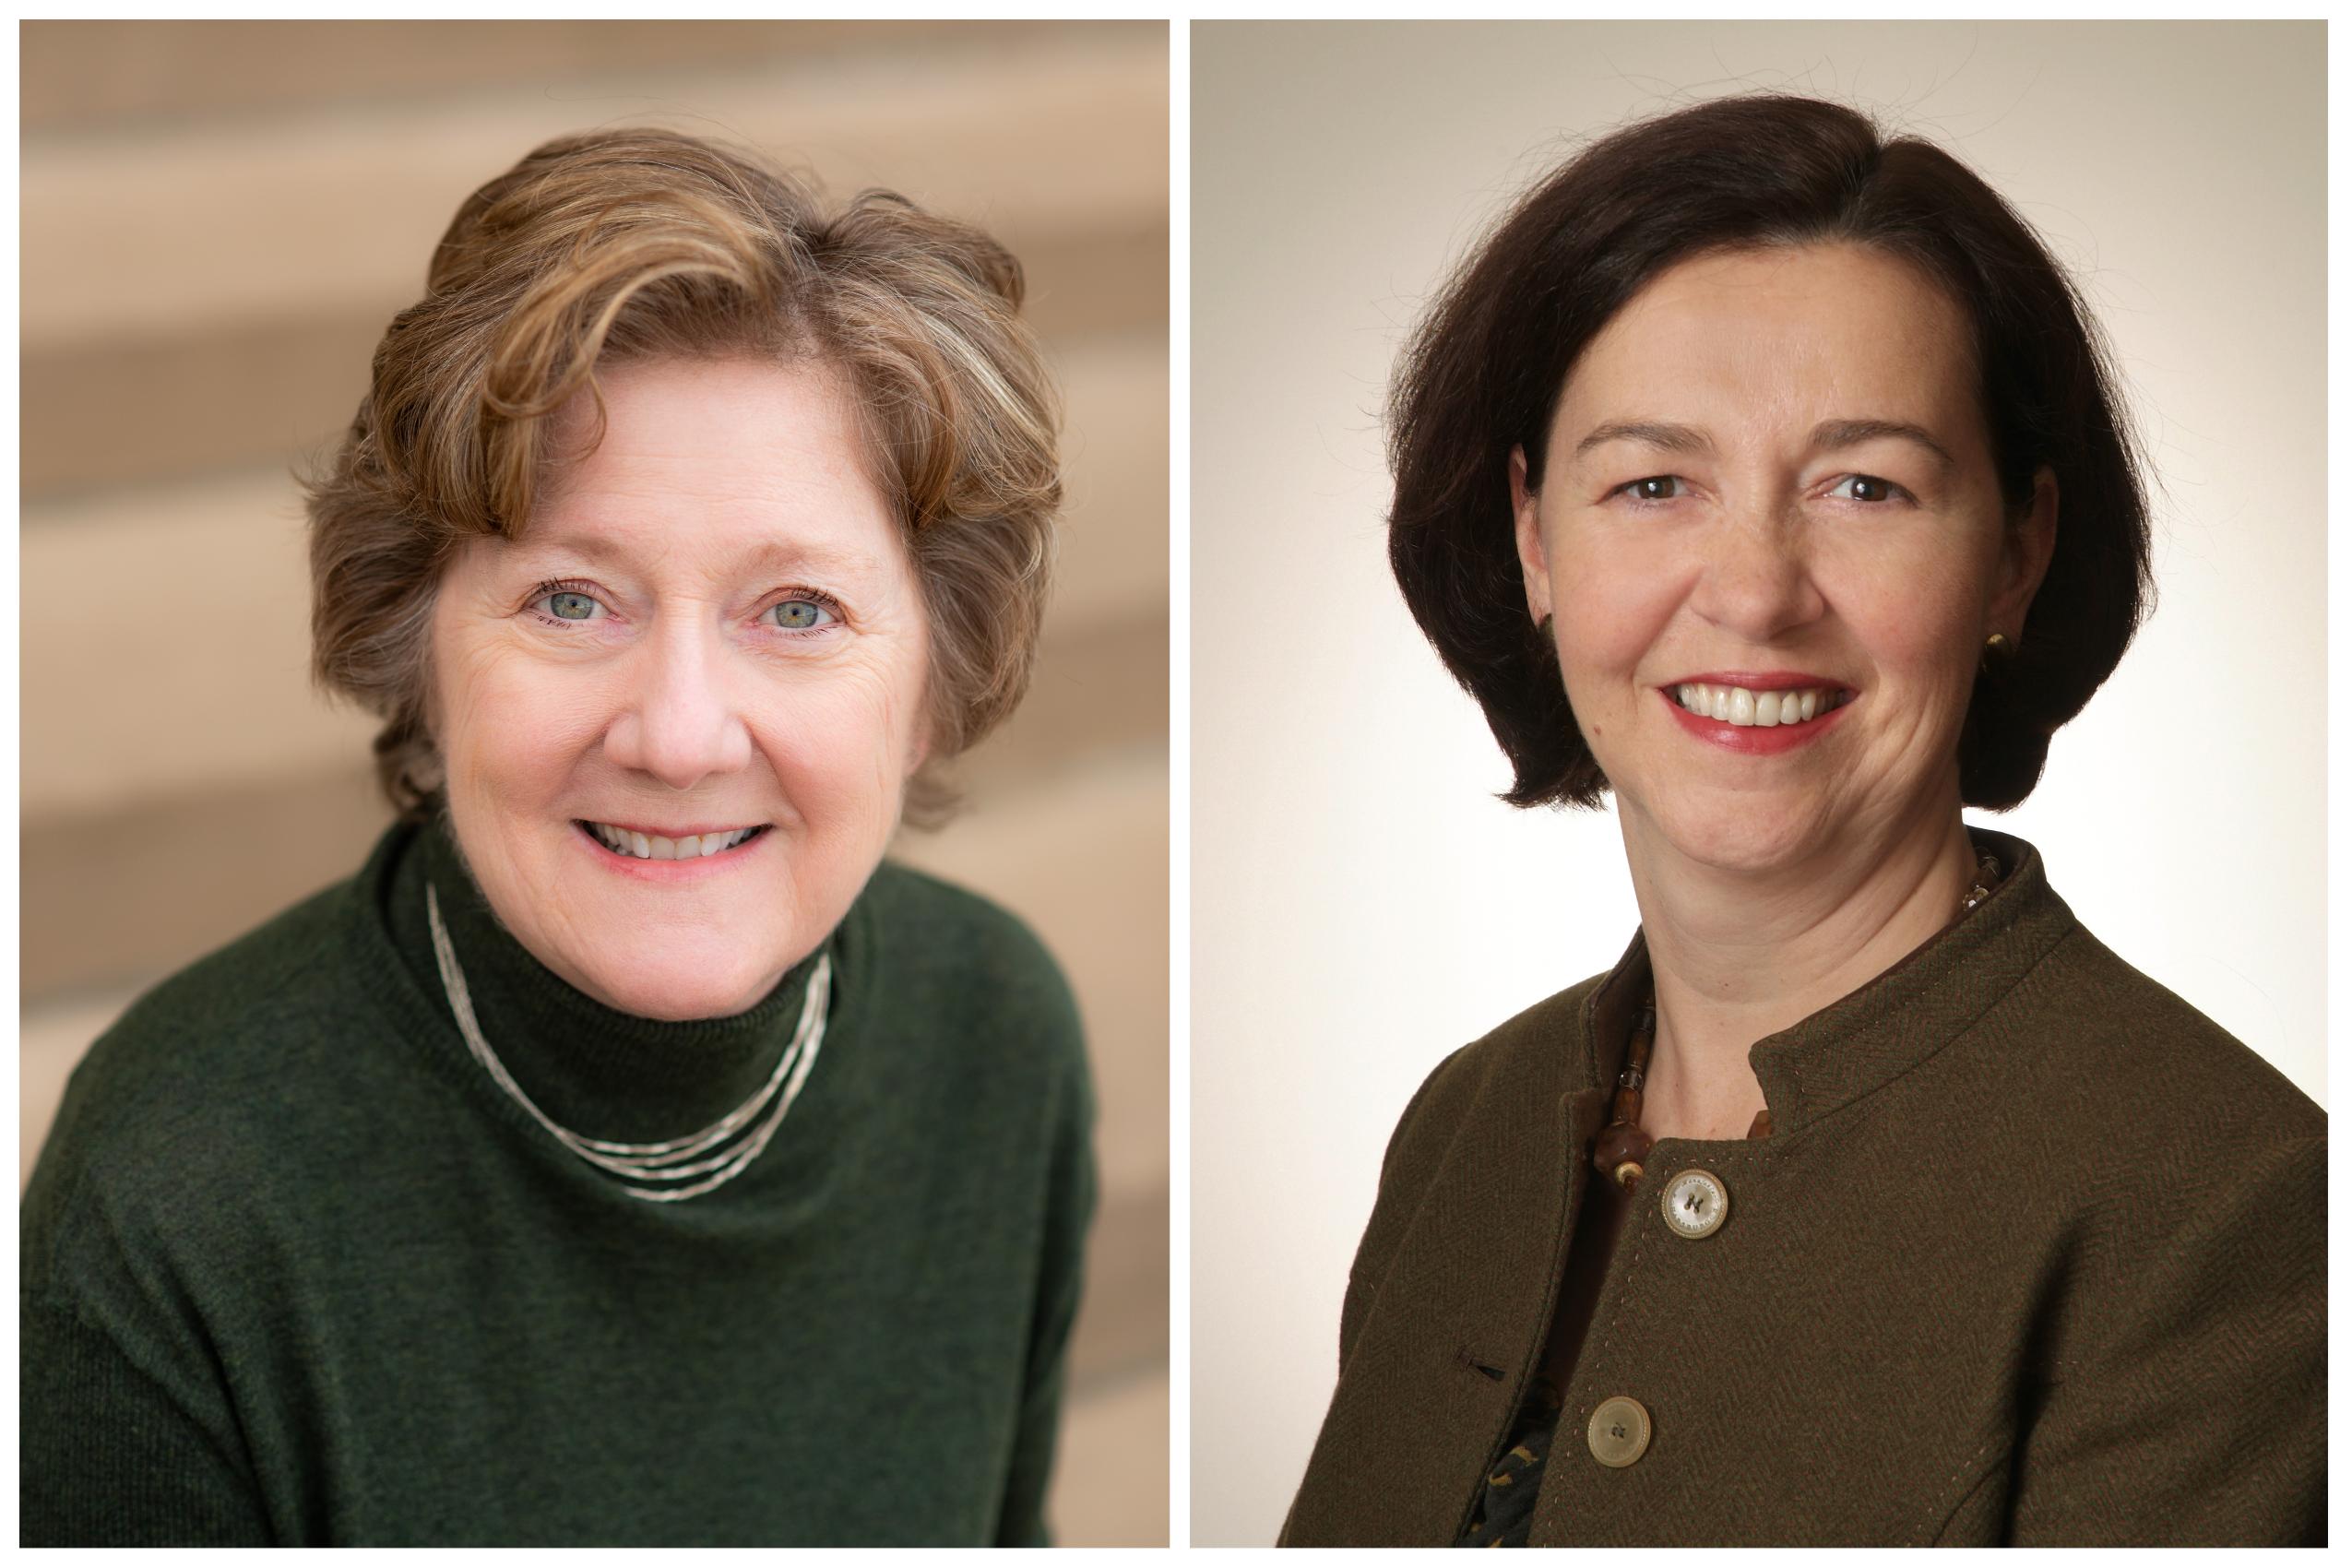 Jane Callahan & Barbara Carswell Headshots